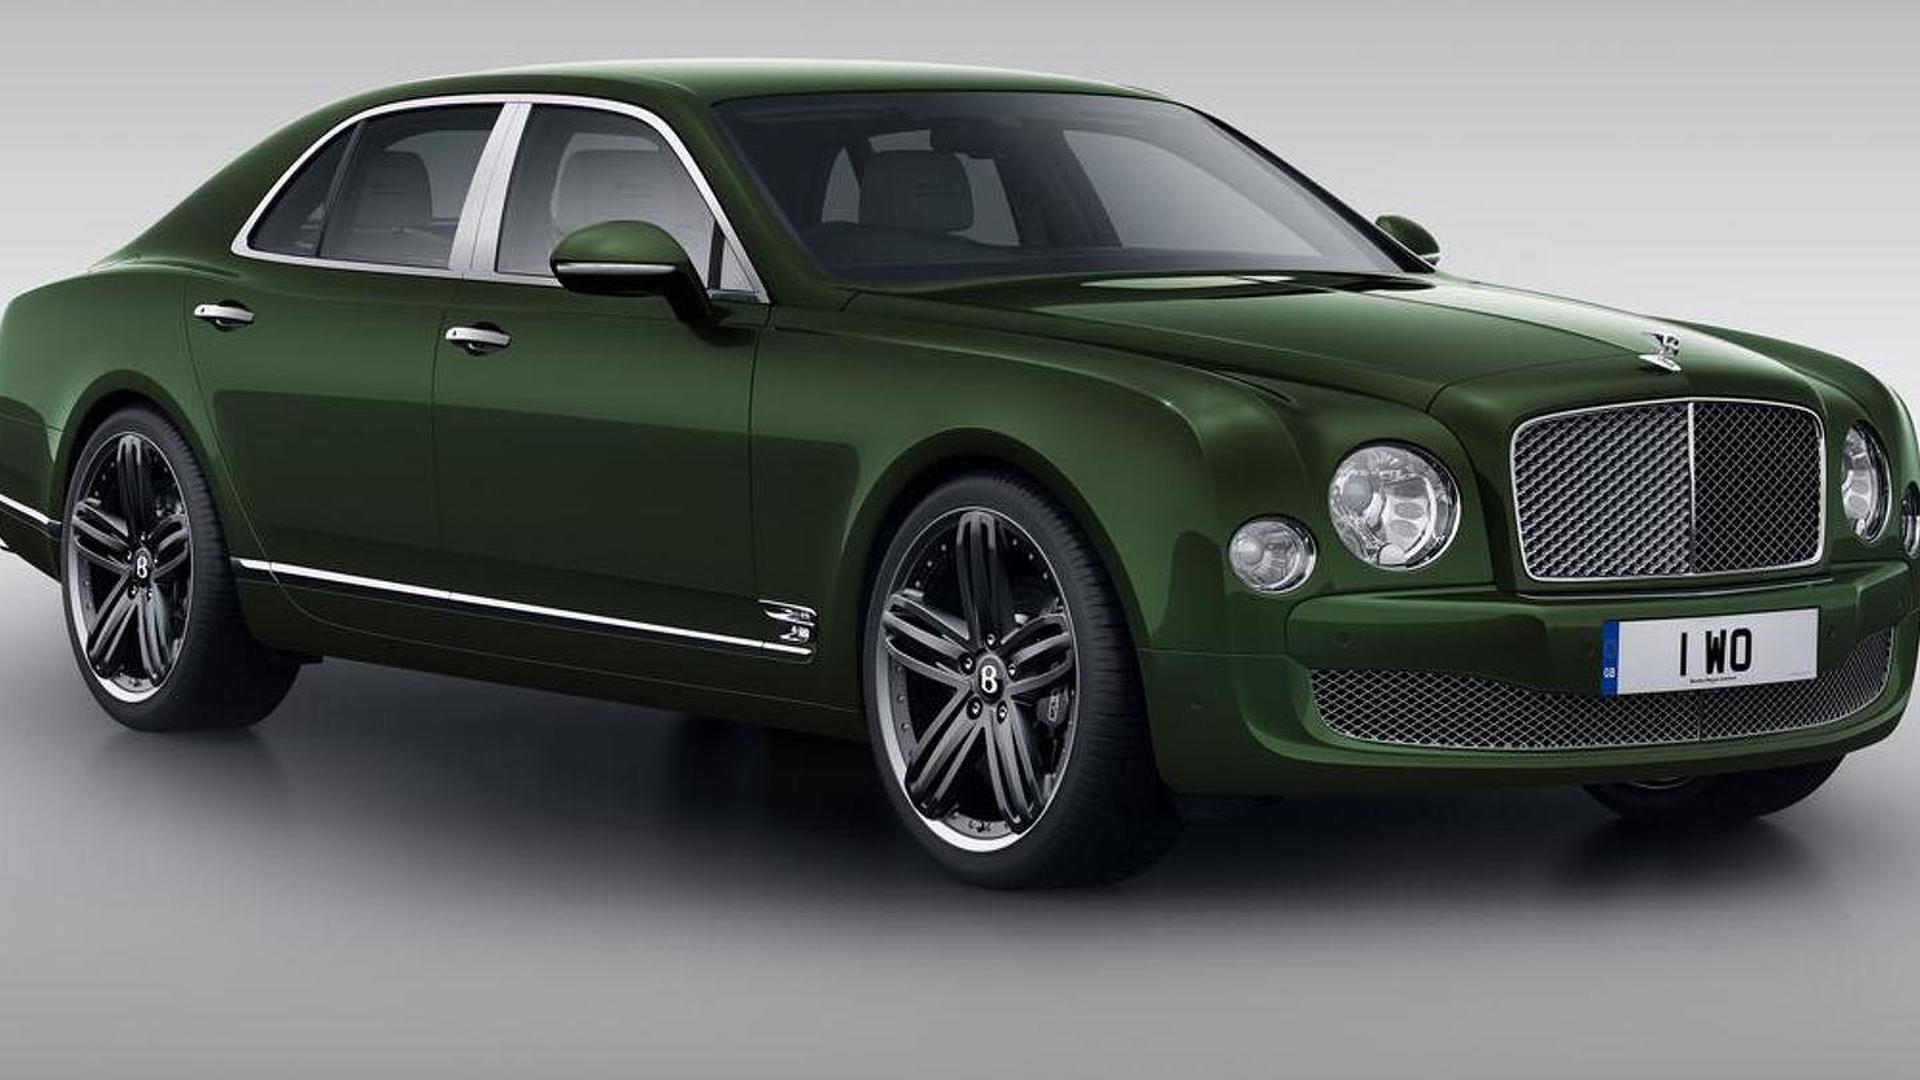 Bentley Mulsanne Le Mans Edition headed to Pebble Beach